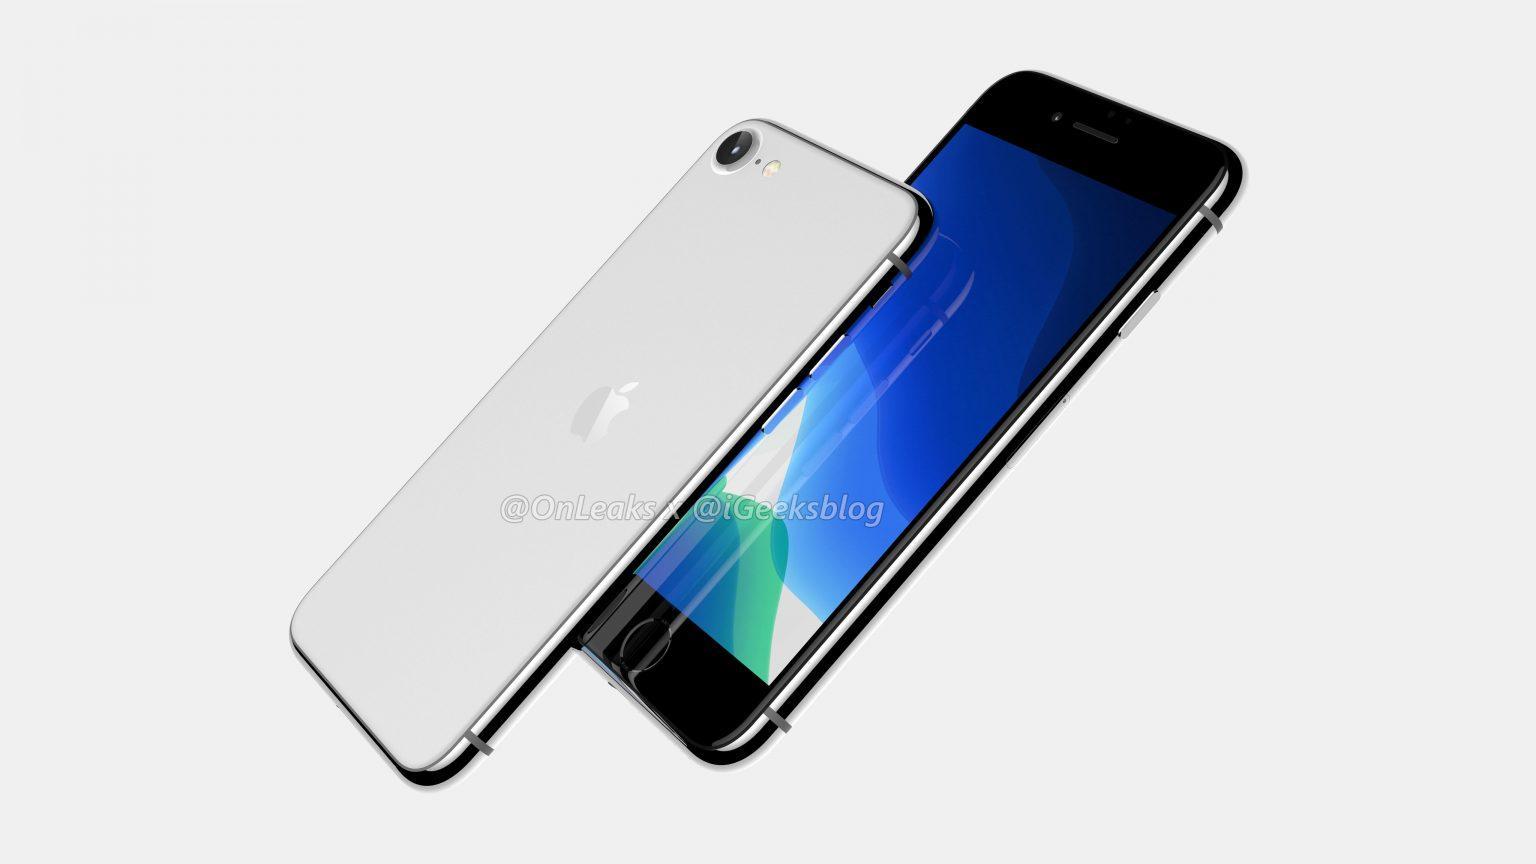 iPhone 9 iPhone SE 2 render